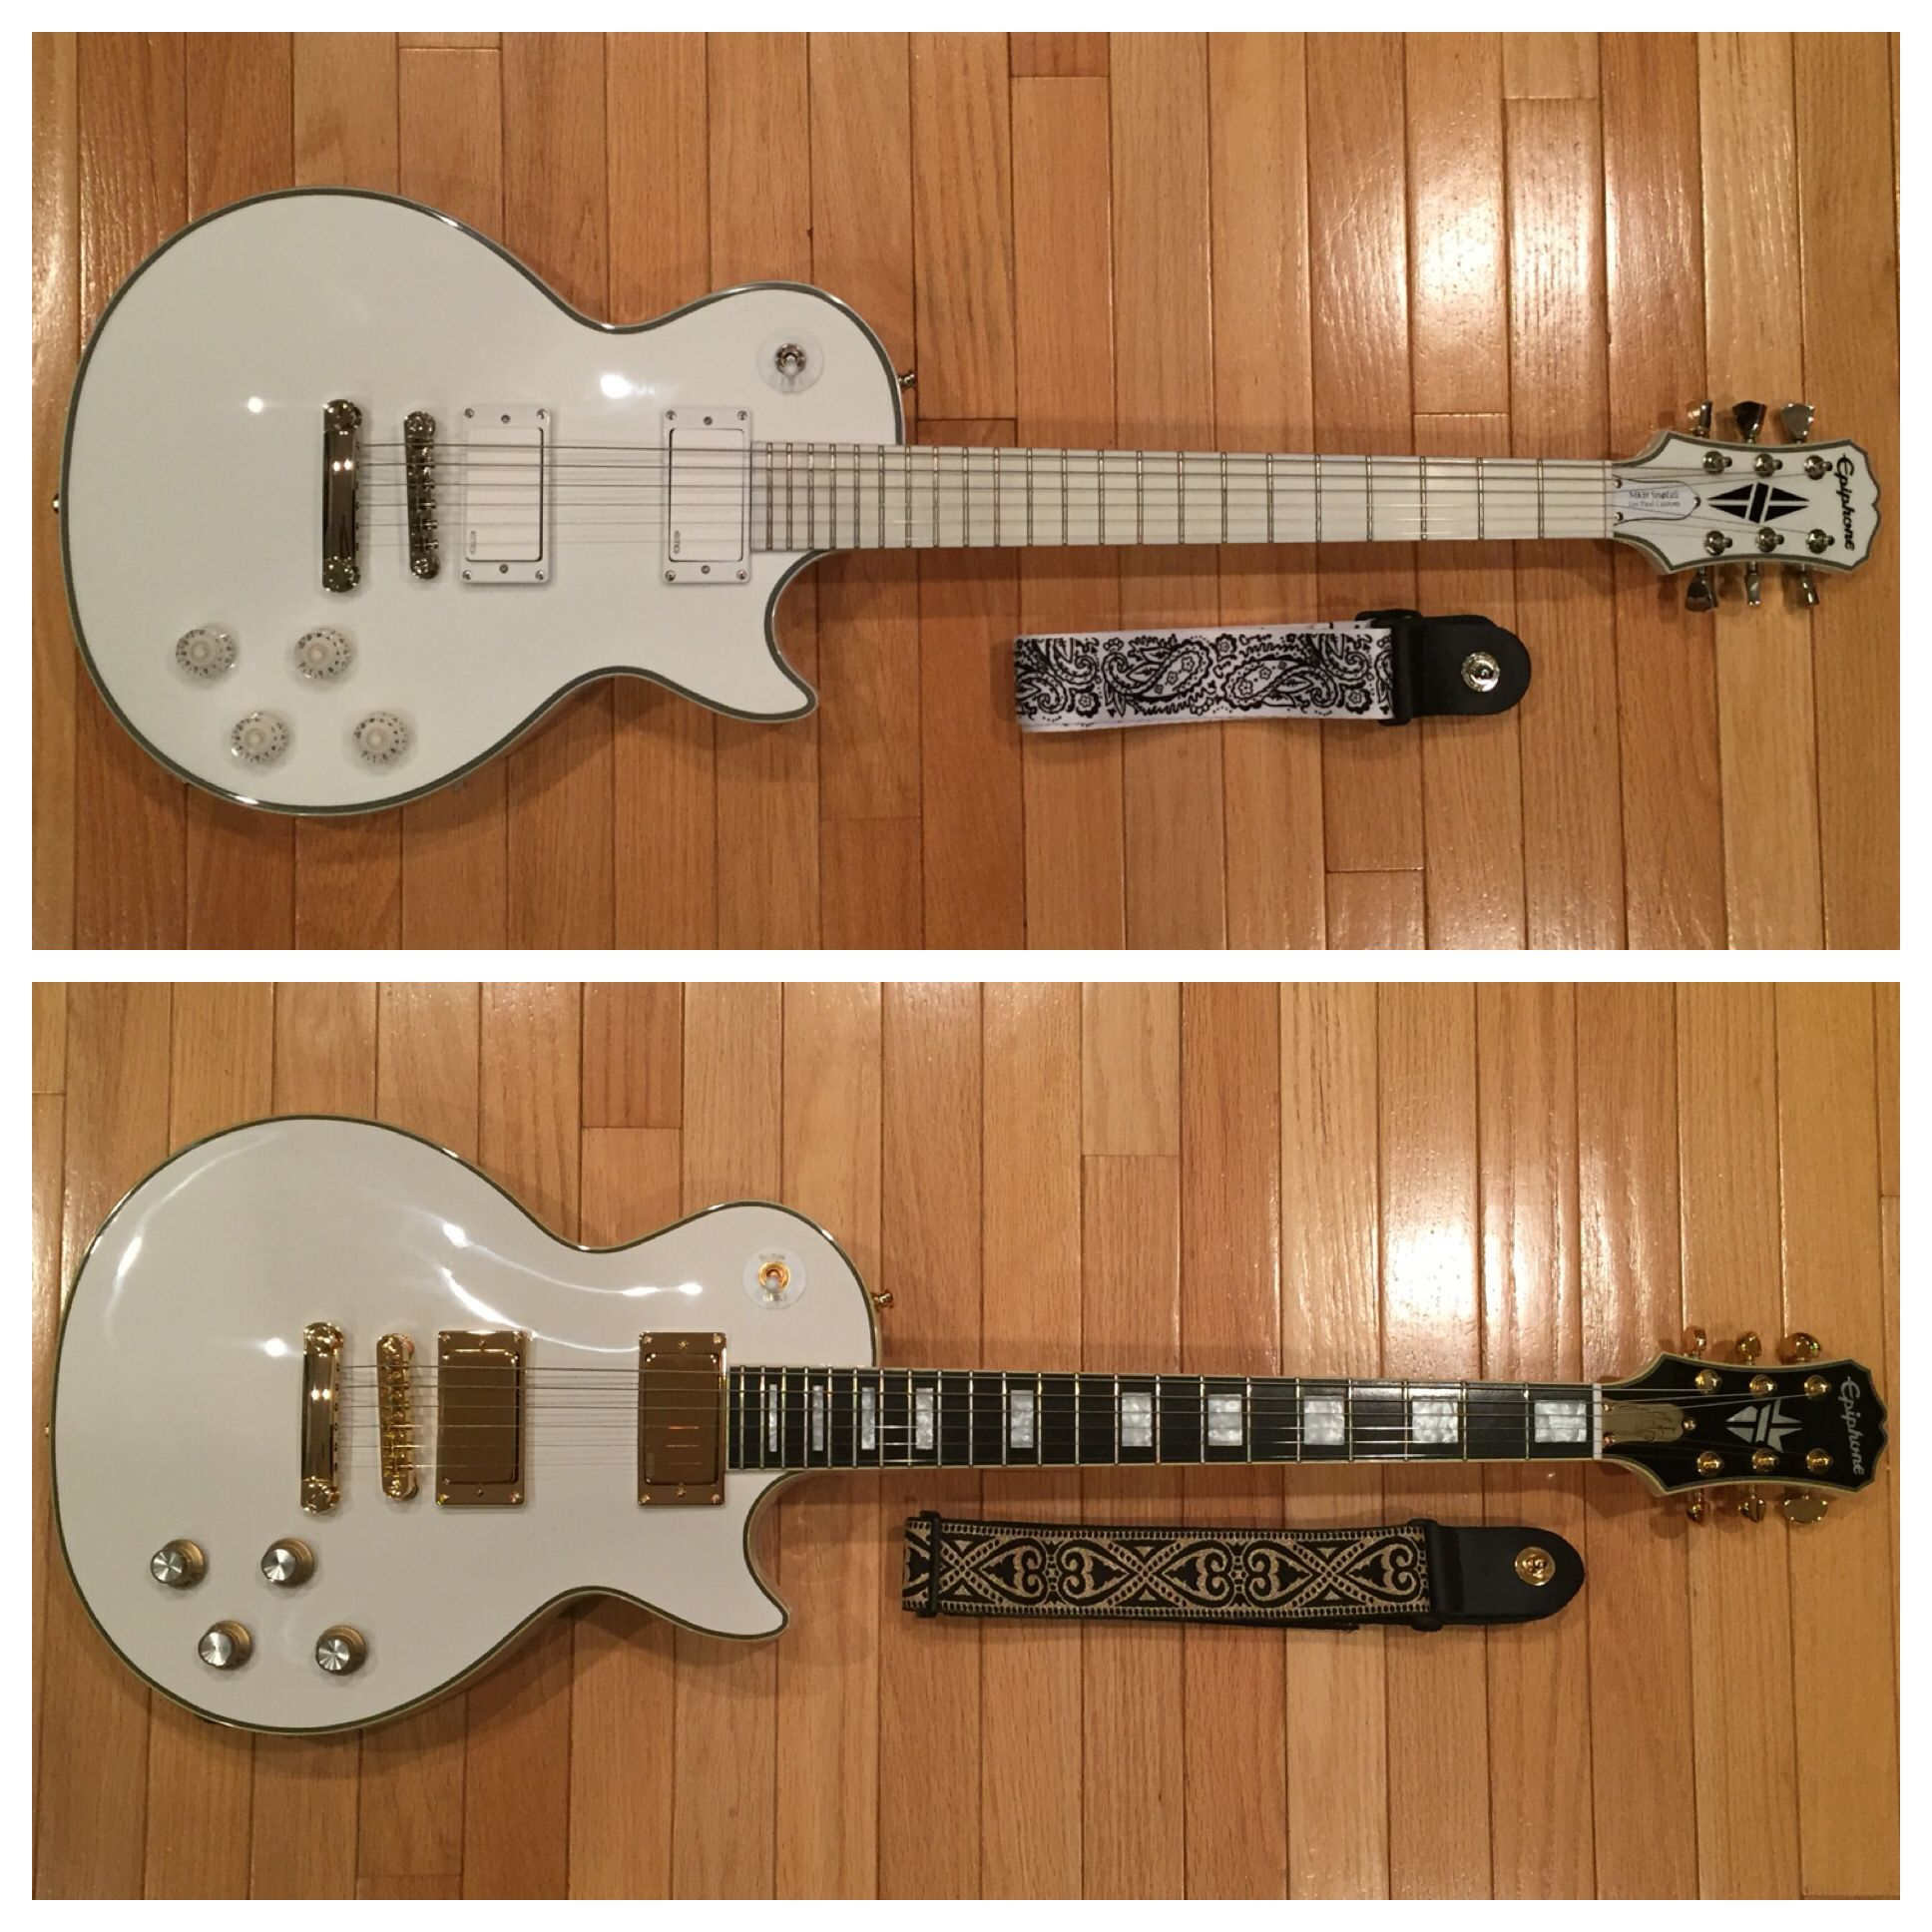 epiphone guitars matt heafy snofall bjorn gelotte les paul signature electric guitars cool. Black Bedroom Furniture Sets. Home Design Ideas